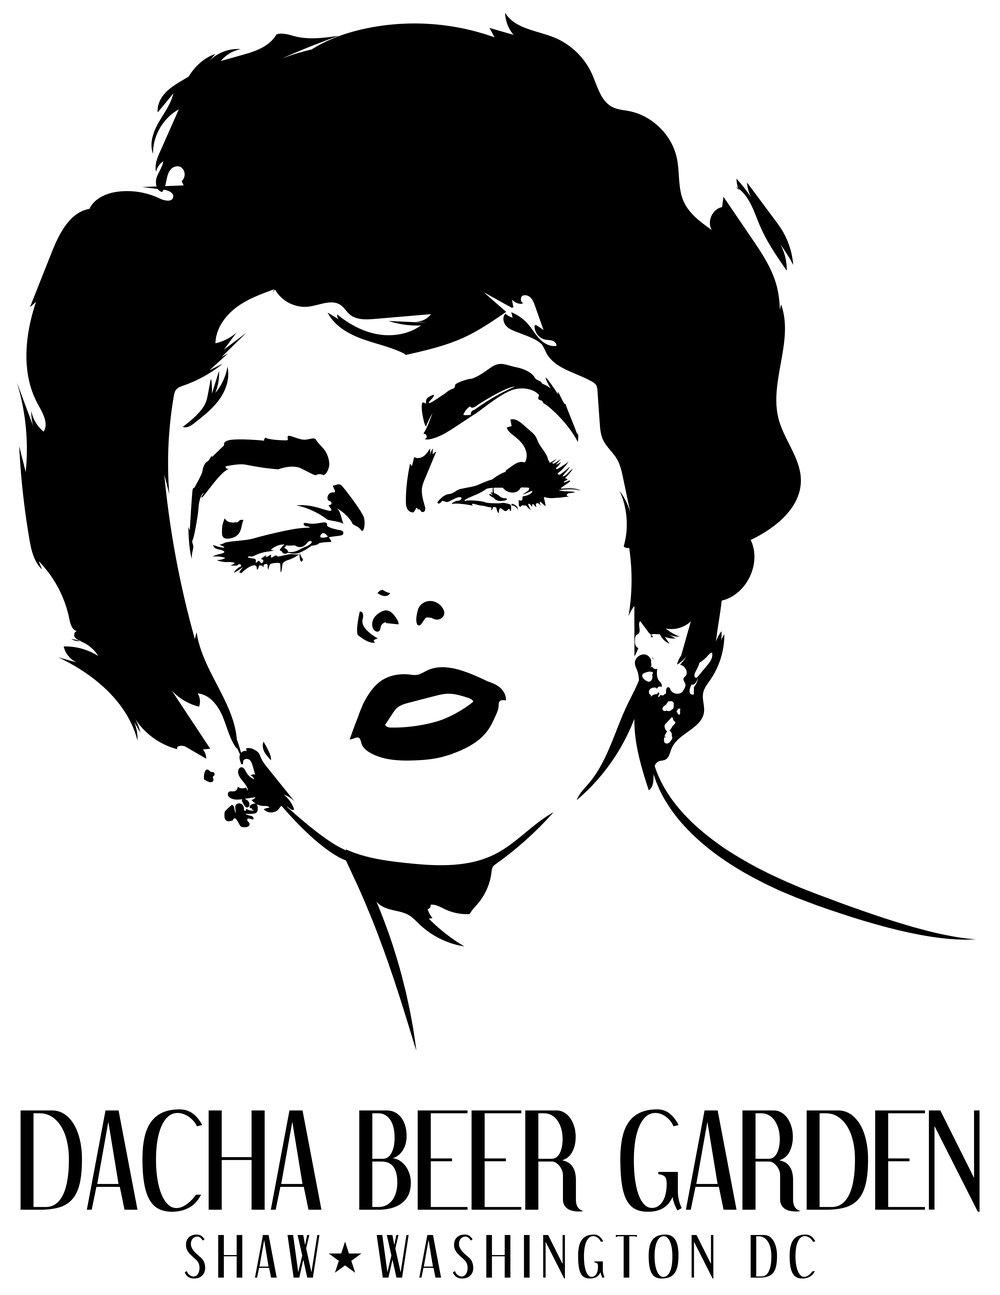 Dacha Beer Garden_-black.jpg